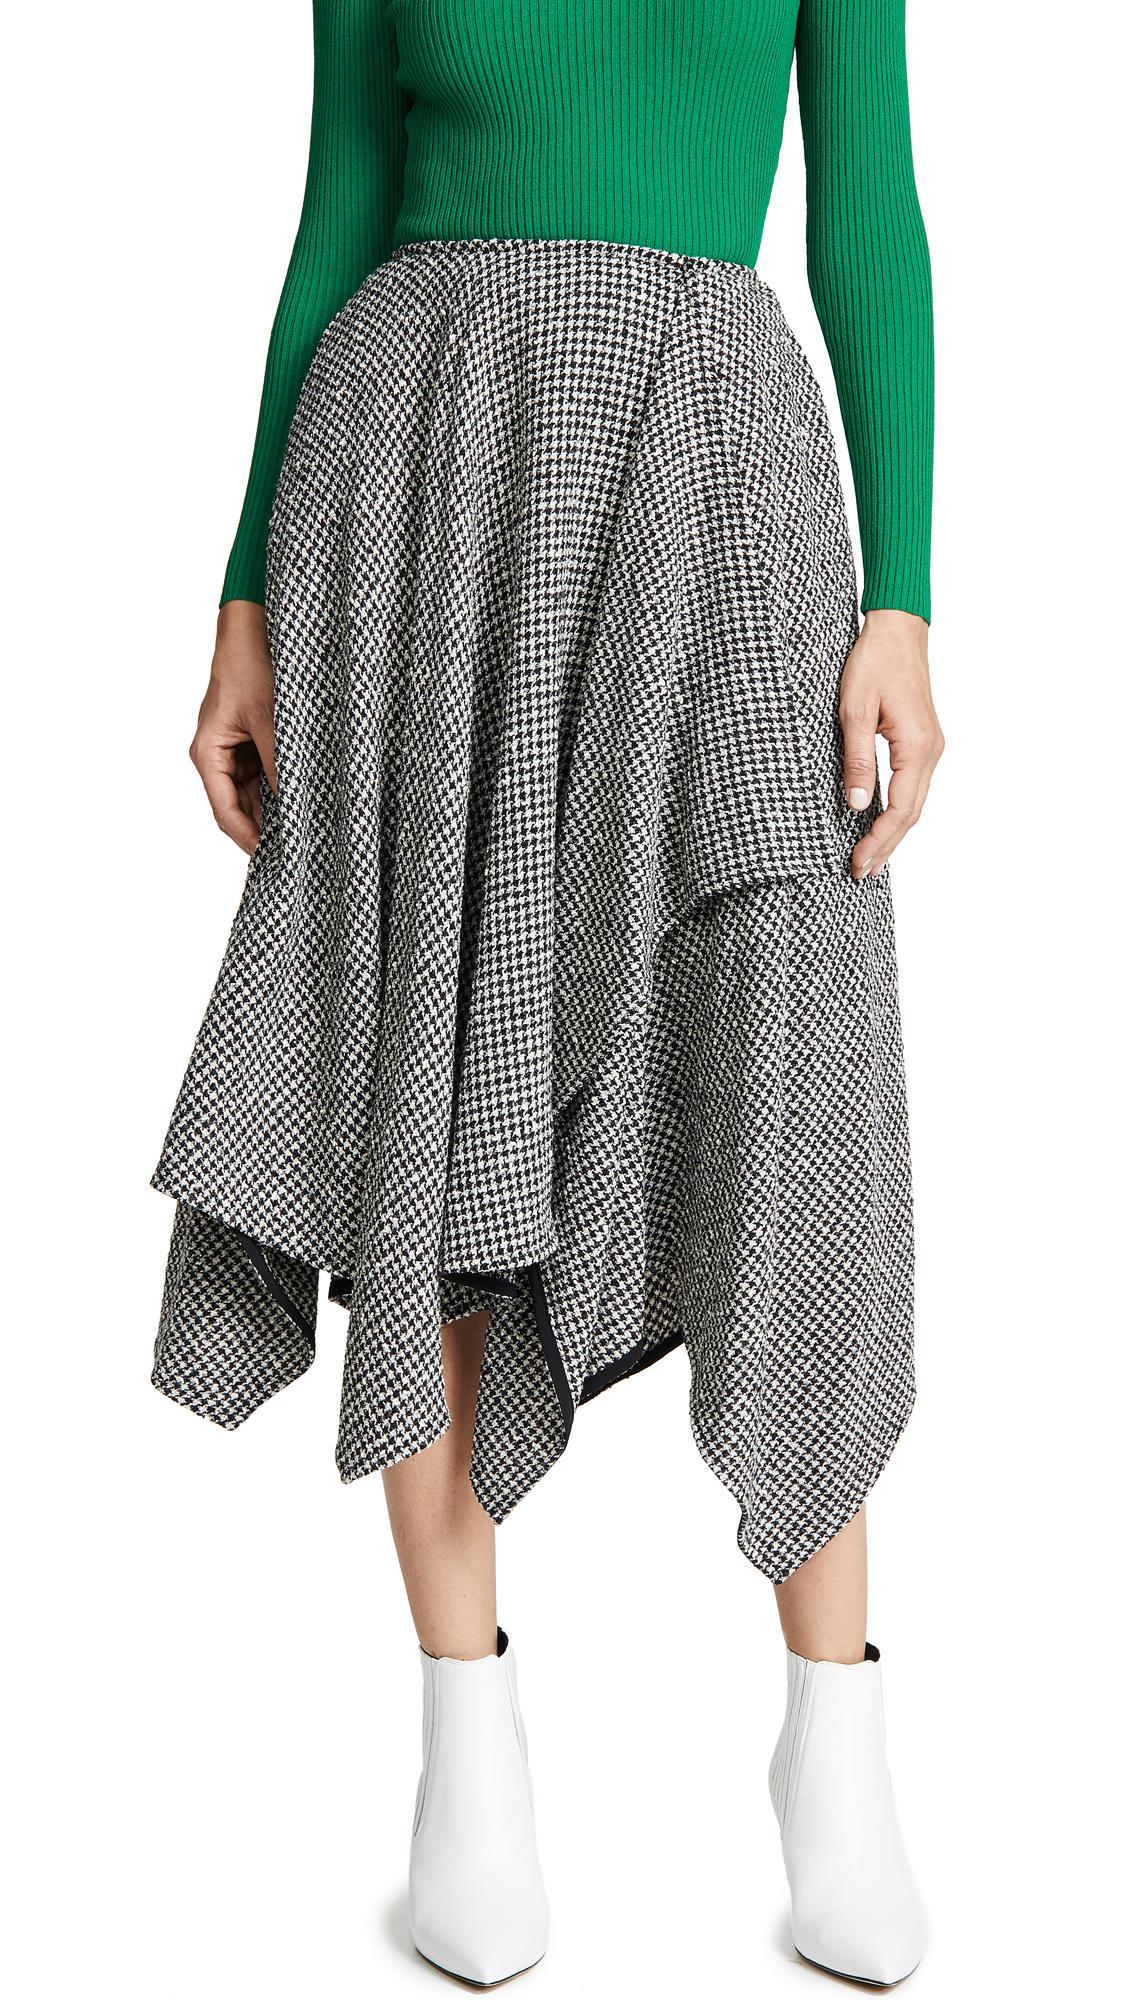 452f23053 Adeam Handkerchief Skirt In Black/White Check | ModeSens